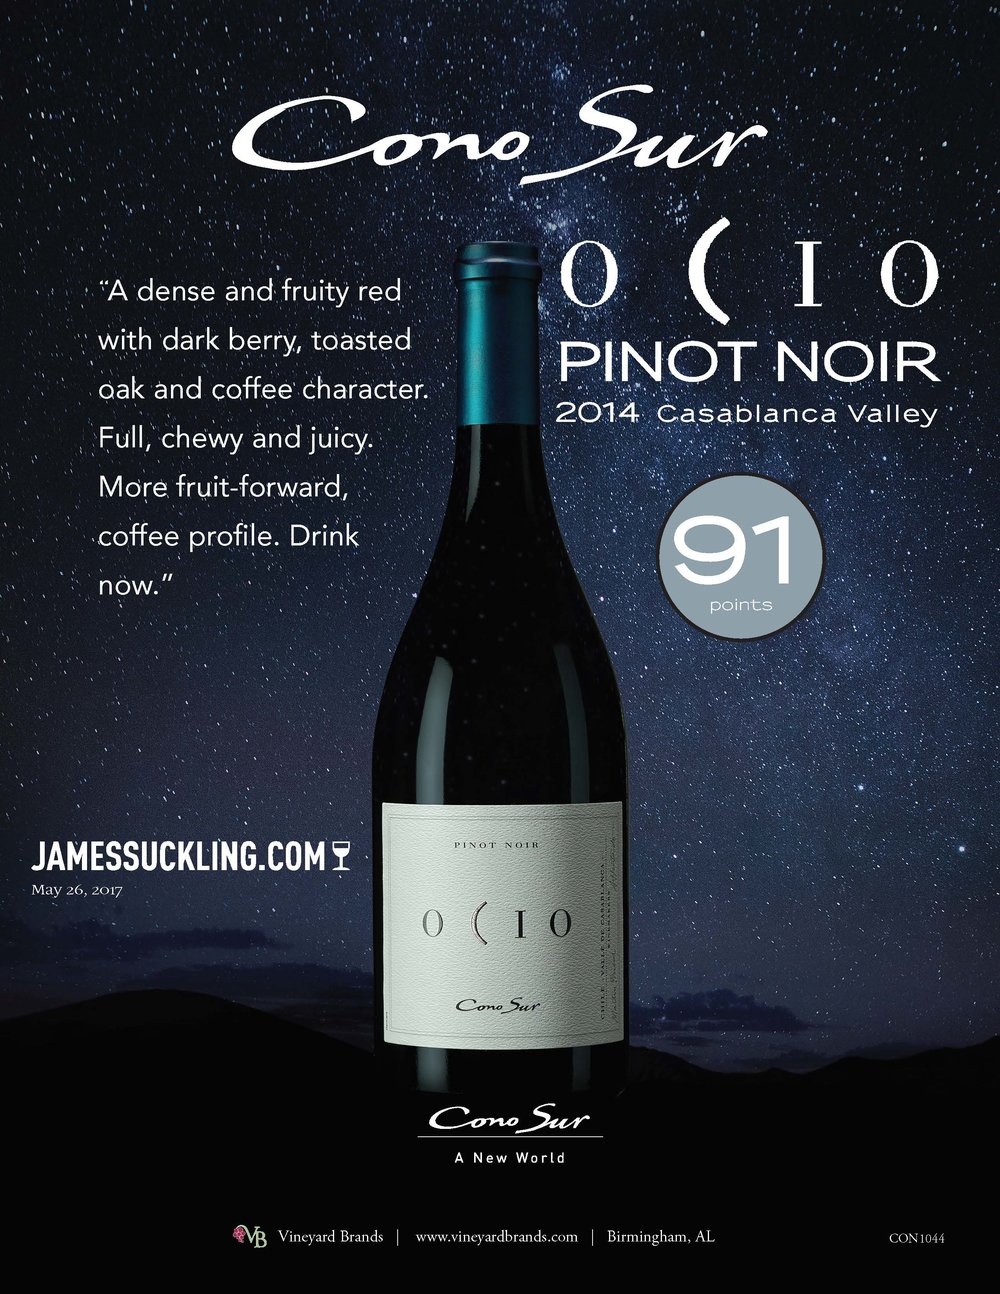 Cono Sur Ocio Pinot Noir 2014.jpg